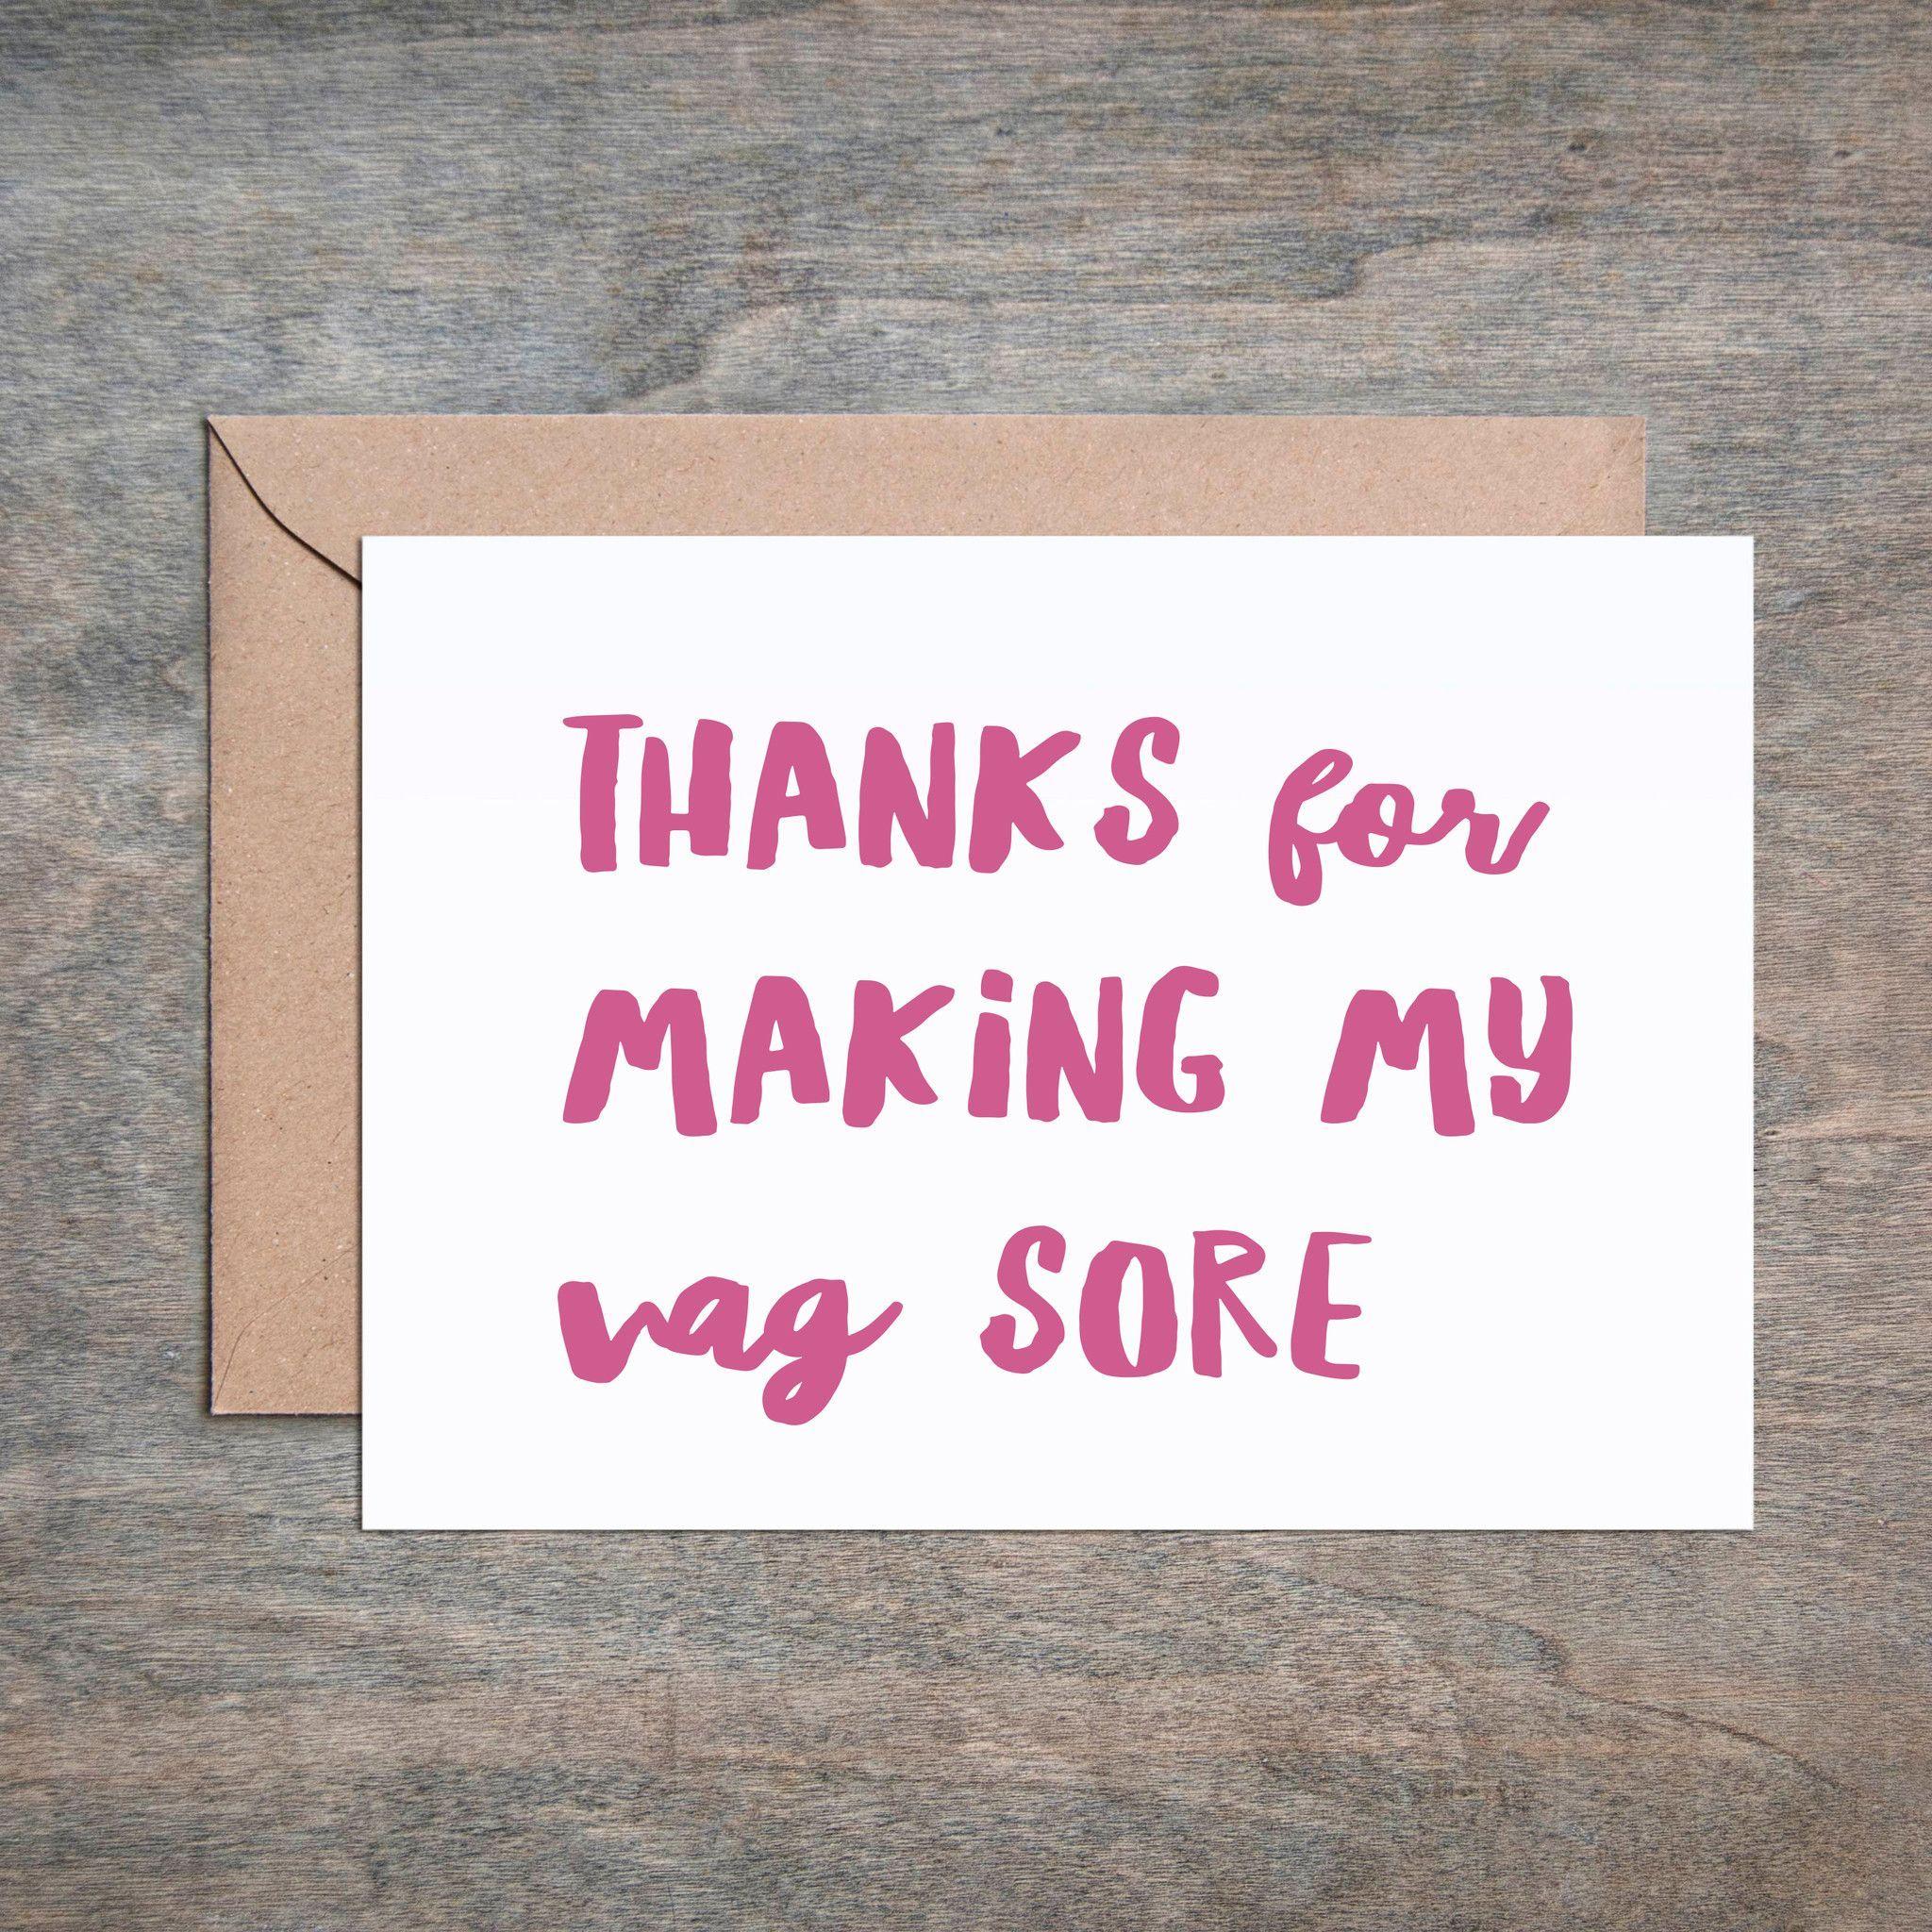 Thanks for Making My Vag Sore